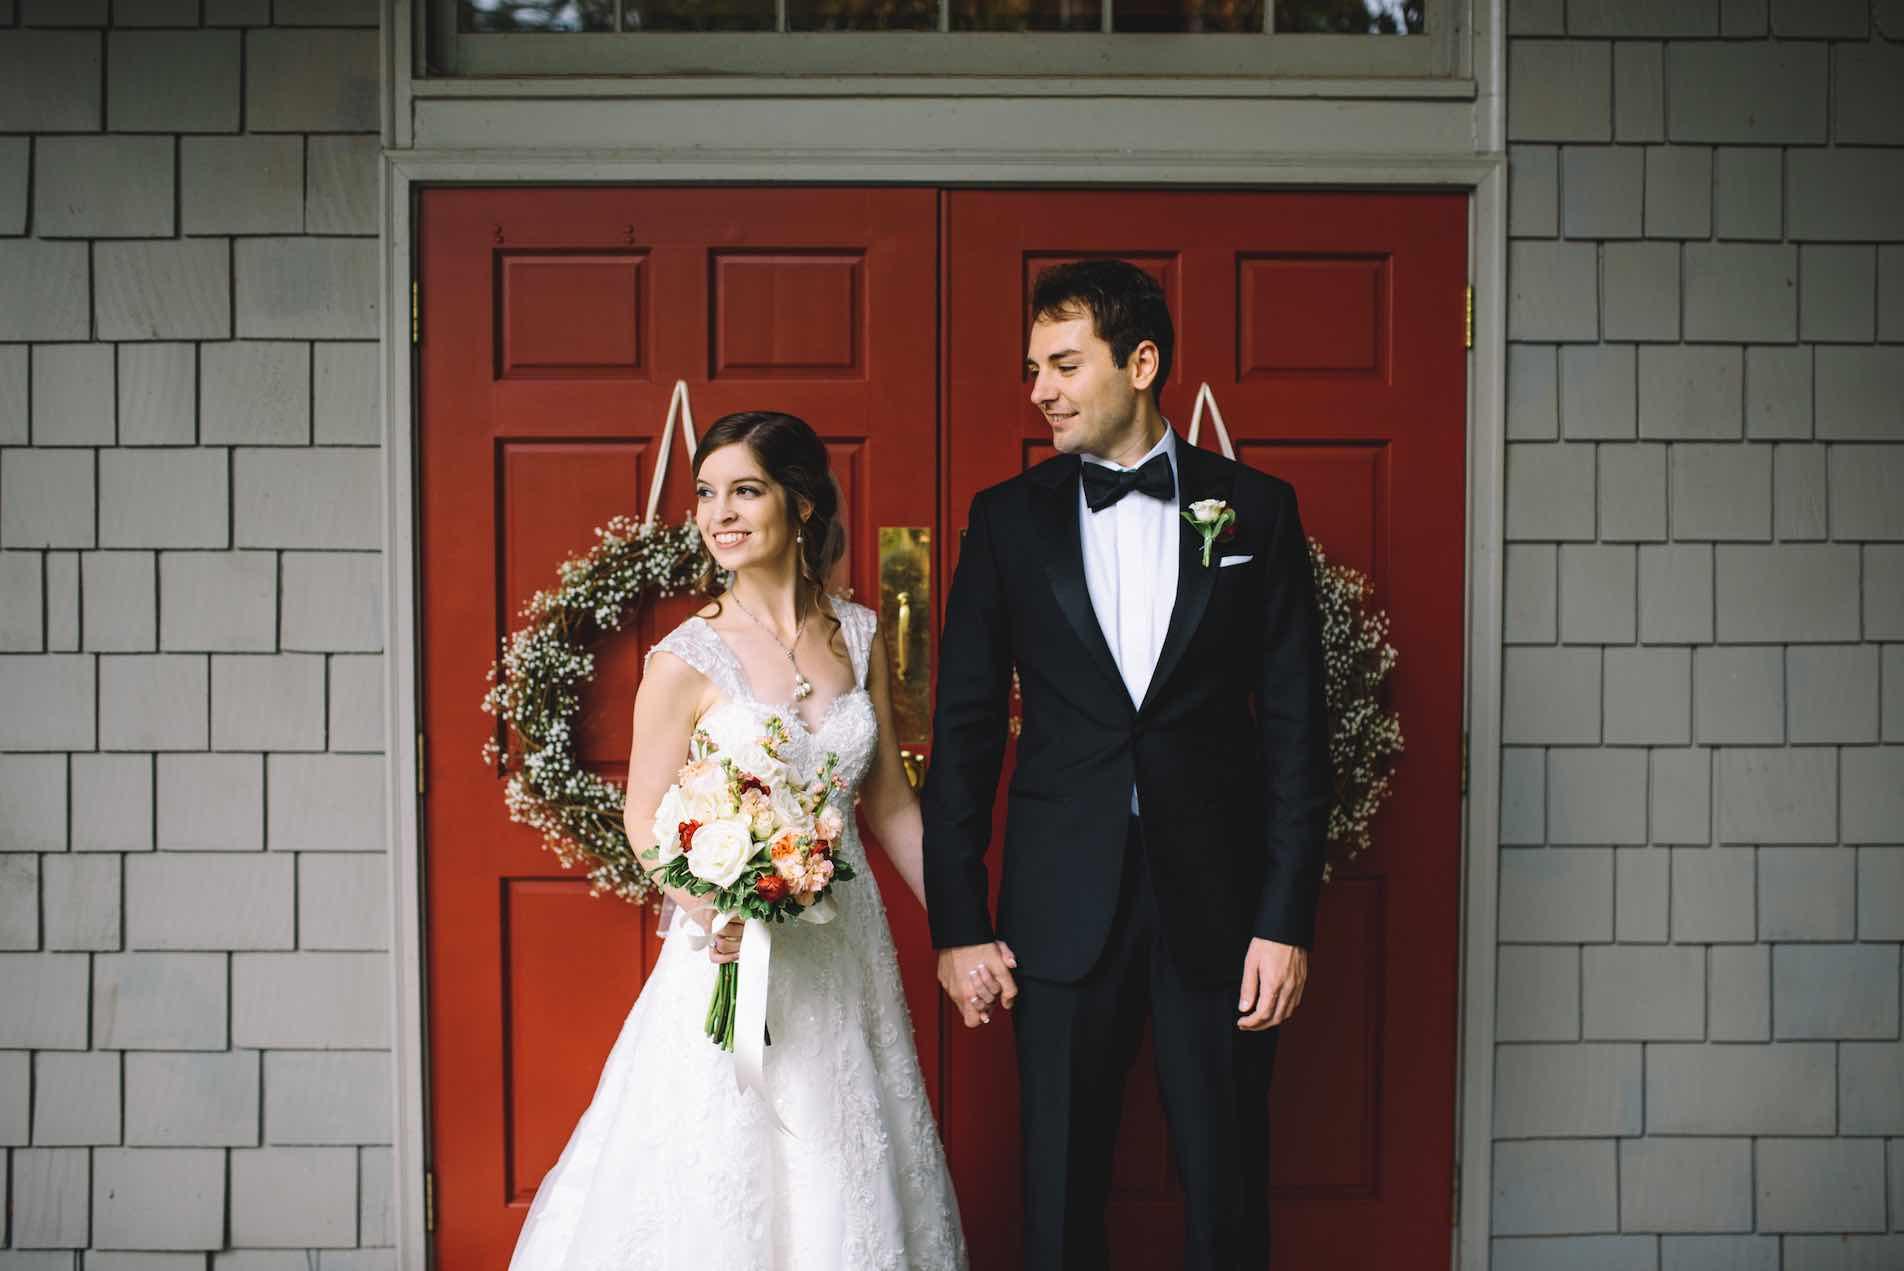 DetailsNashville-Rachel+Ryan-Formals446.jpeg